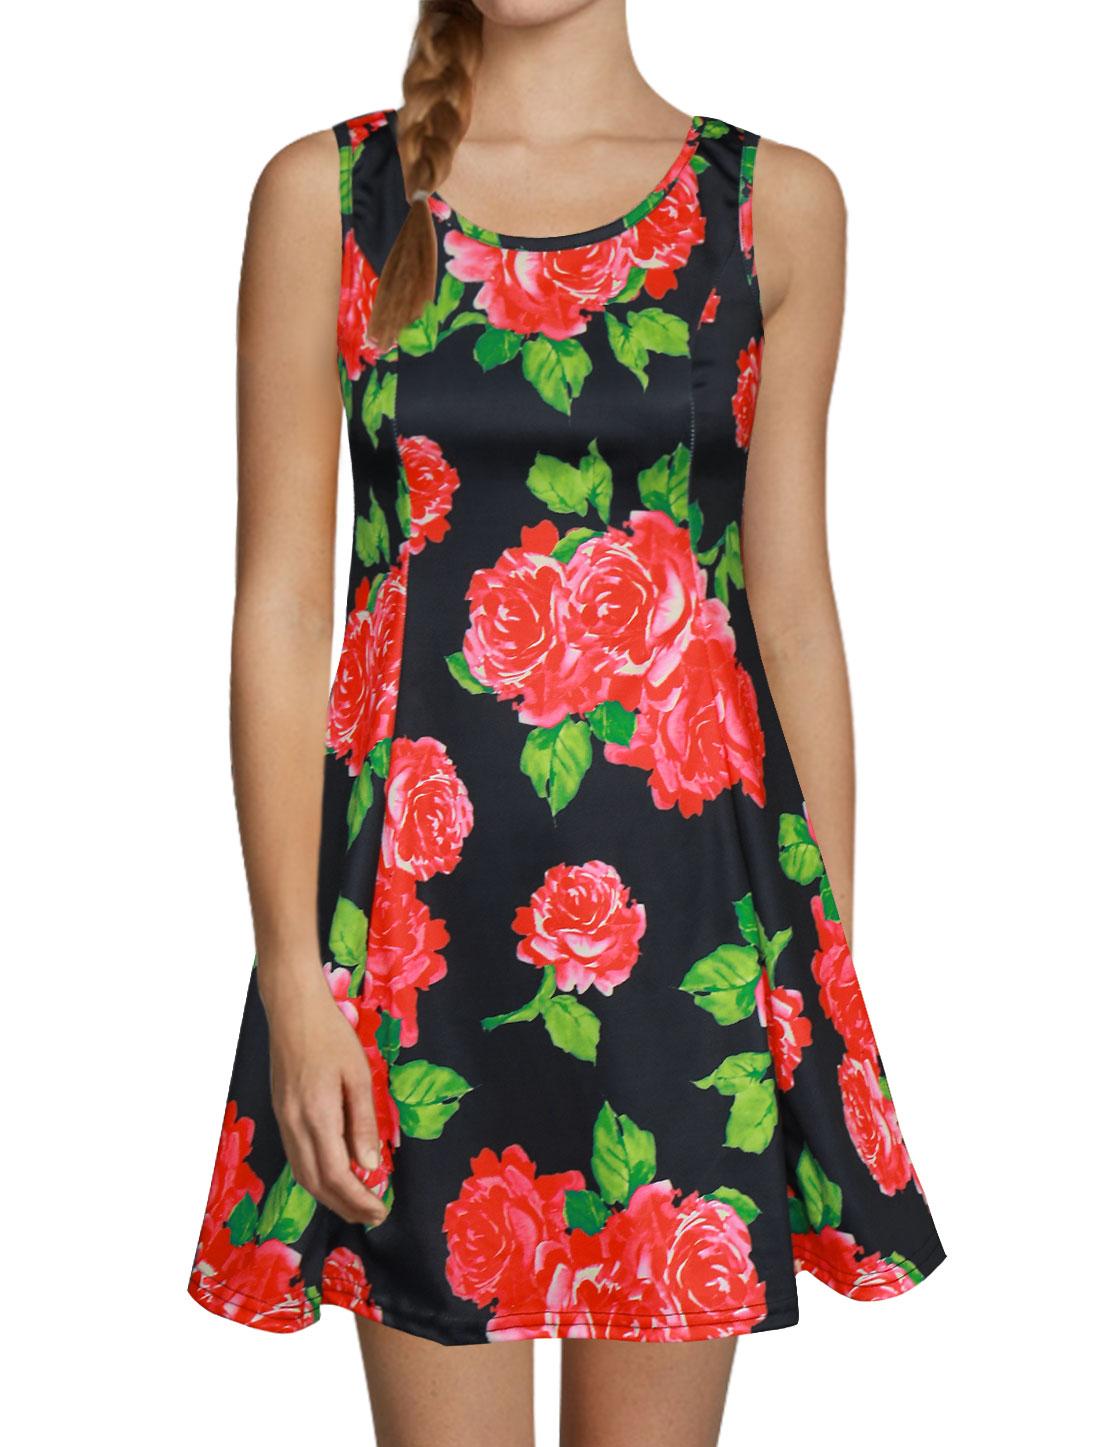 Women Scoop Neck Sleeveless Floral Prints Mini A Line Dress Black XS